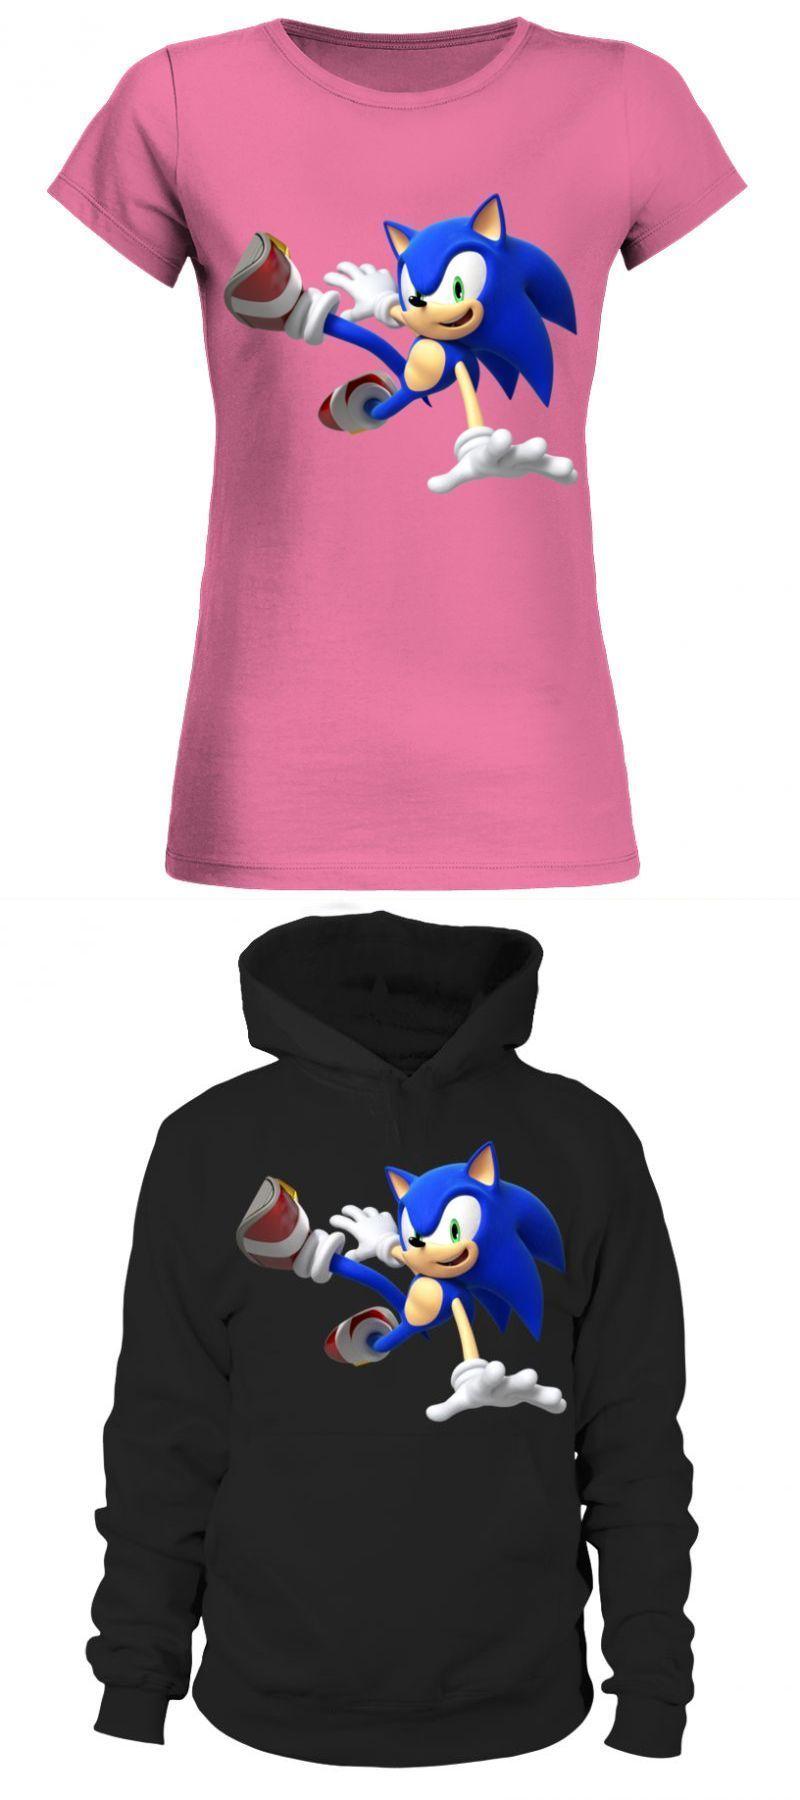 Sonic The Hedgehog 2 Sonic Chaos Sonic K Sonic The Hedgehog T Shirt